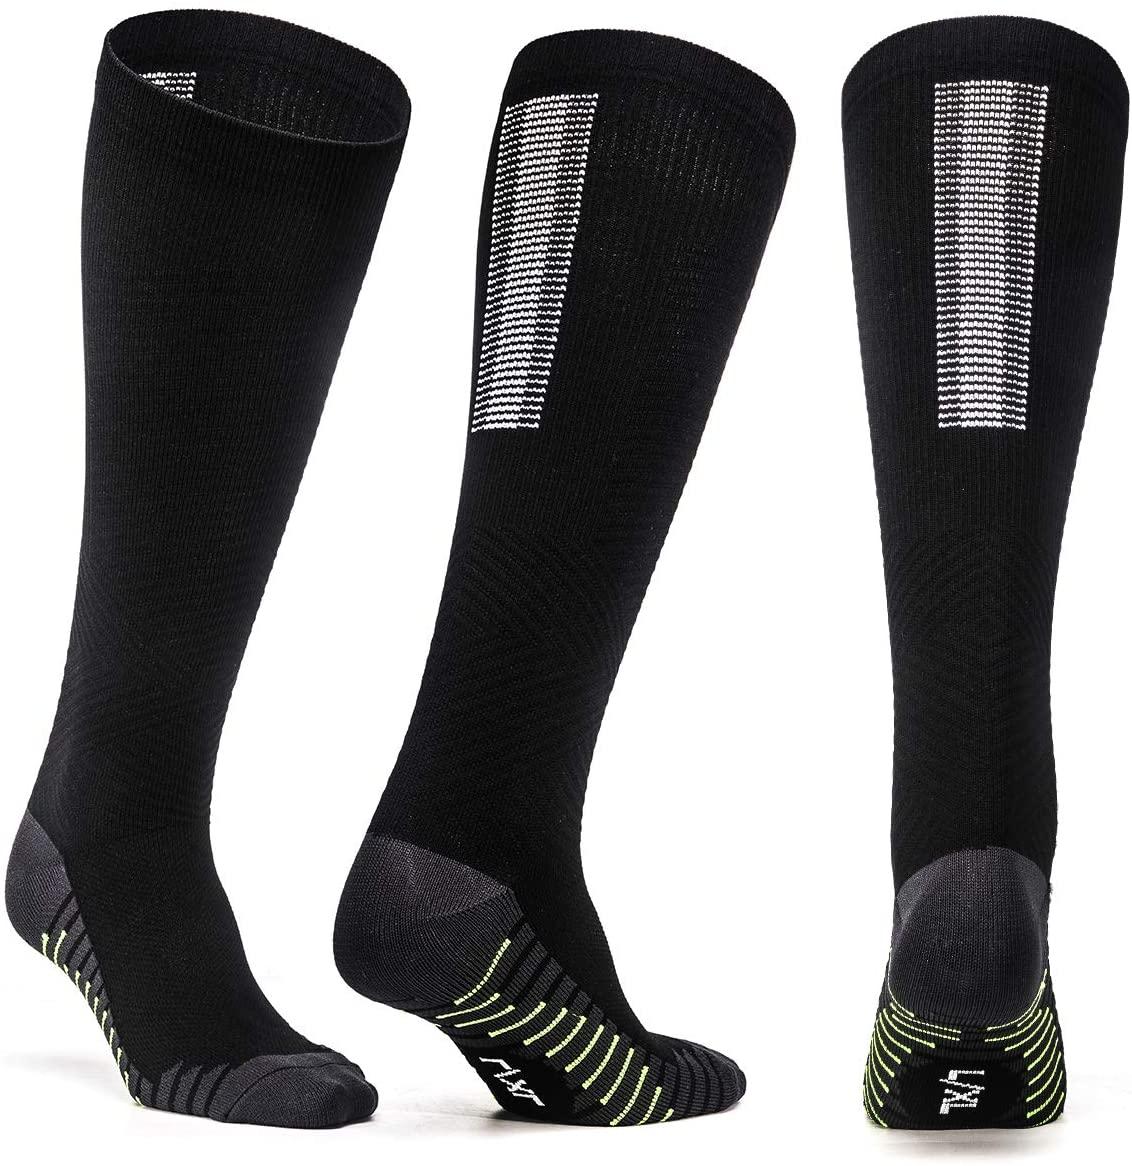 2Pairs Compression Socks for Men and Women 20-30mmHg Fitness Medical Nursing Socks